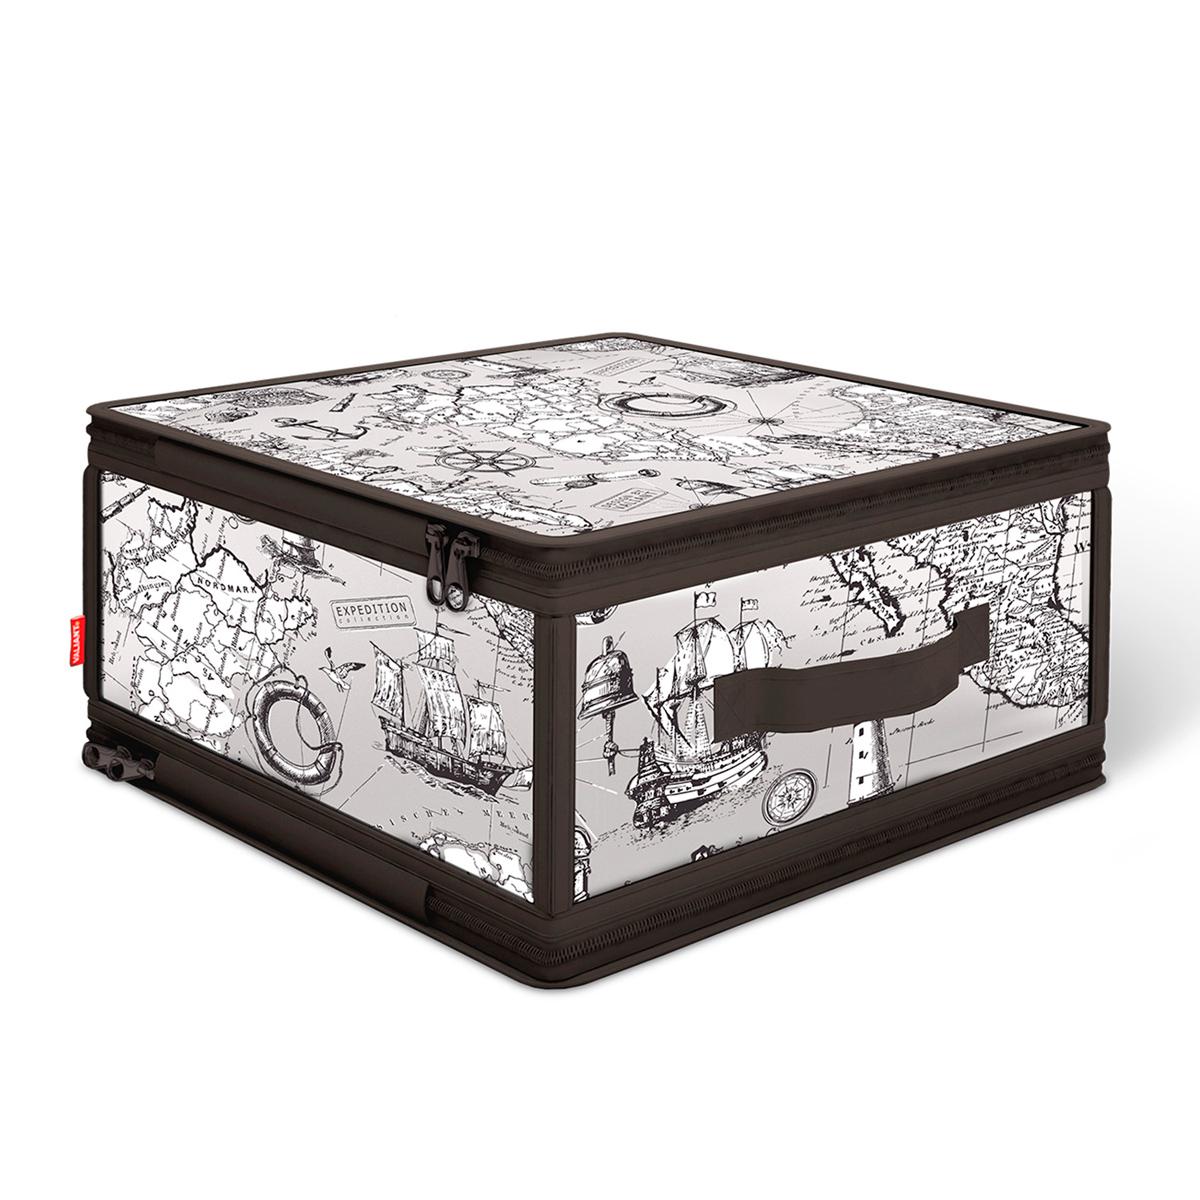 Кофр для хранения Valiant Expedition, с застежкой-молнией, 30 х 28 х 15 см кофр для хранения valiant japanese white с застежкой молнией 30 х 28 х 15 см